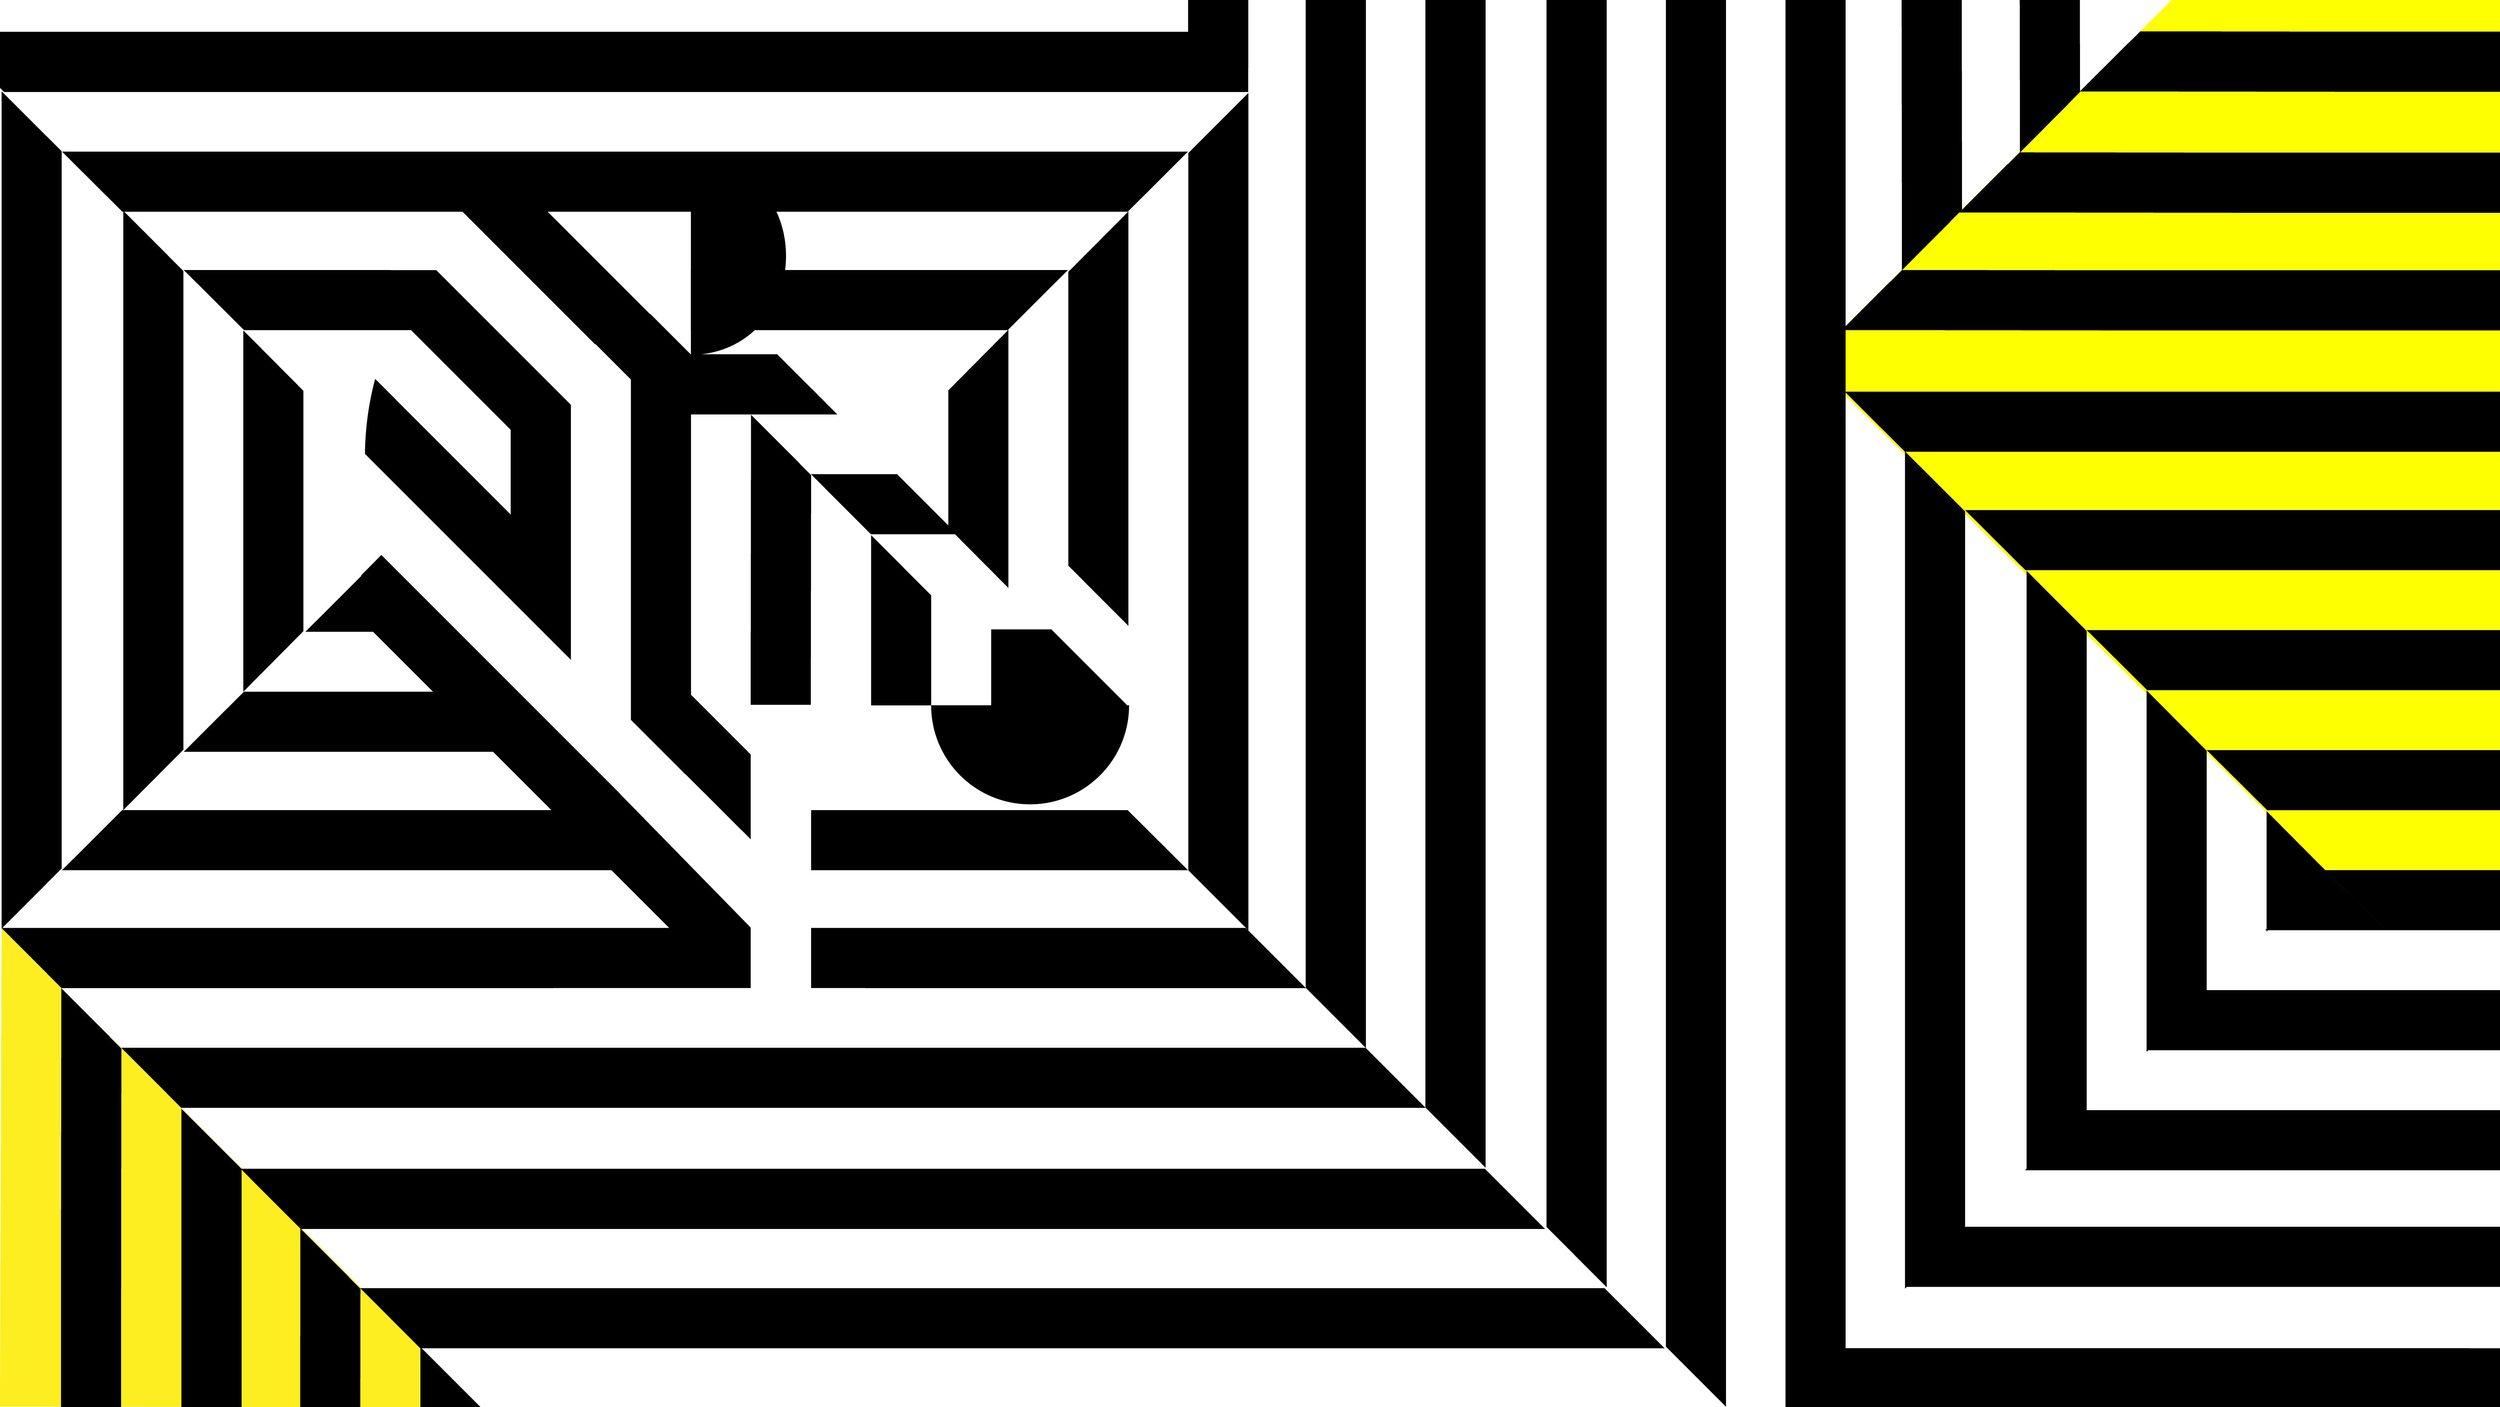 zebra_8.19_forweb-09.jpg